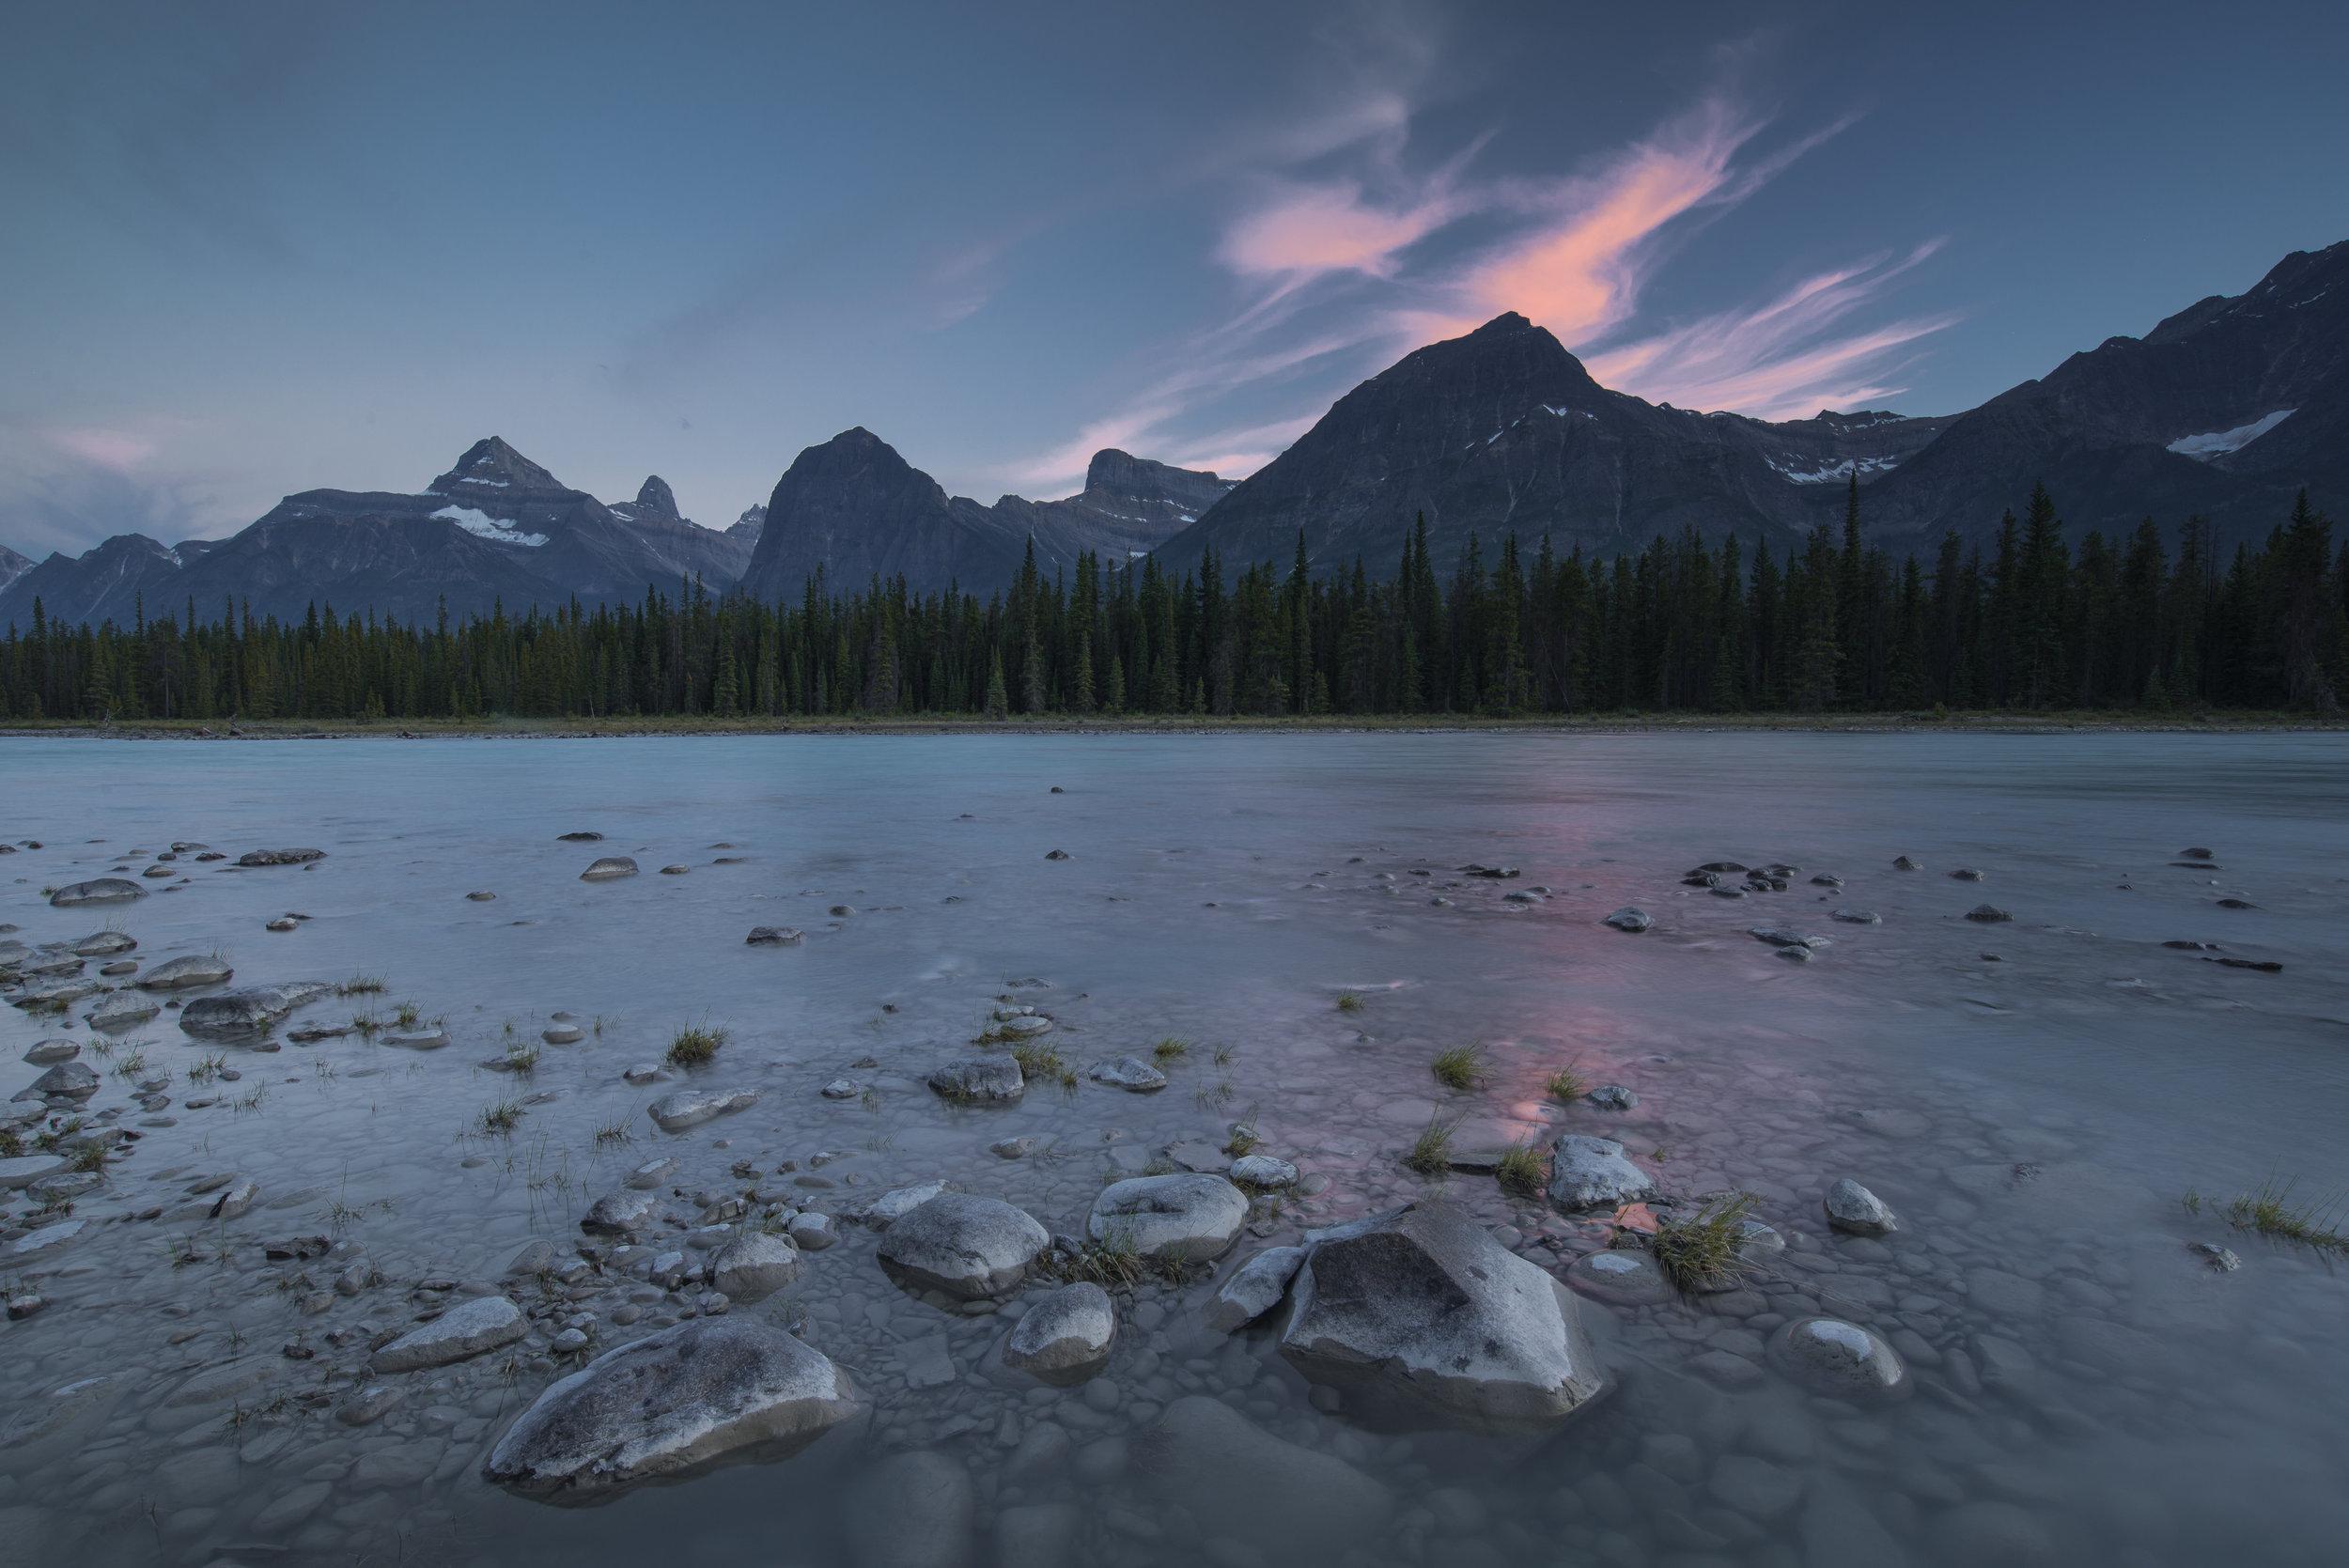 Sunset over Athabasca River, Jasper National Park